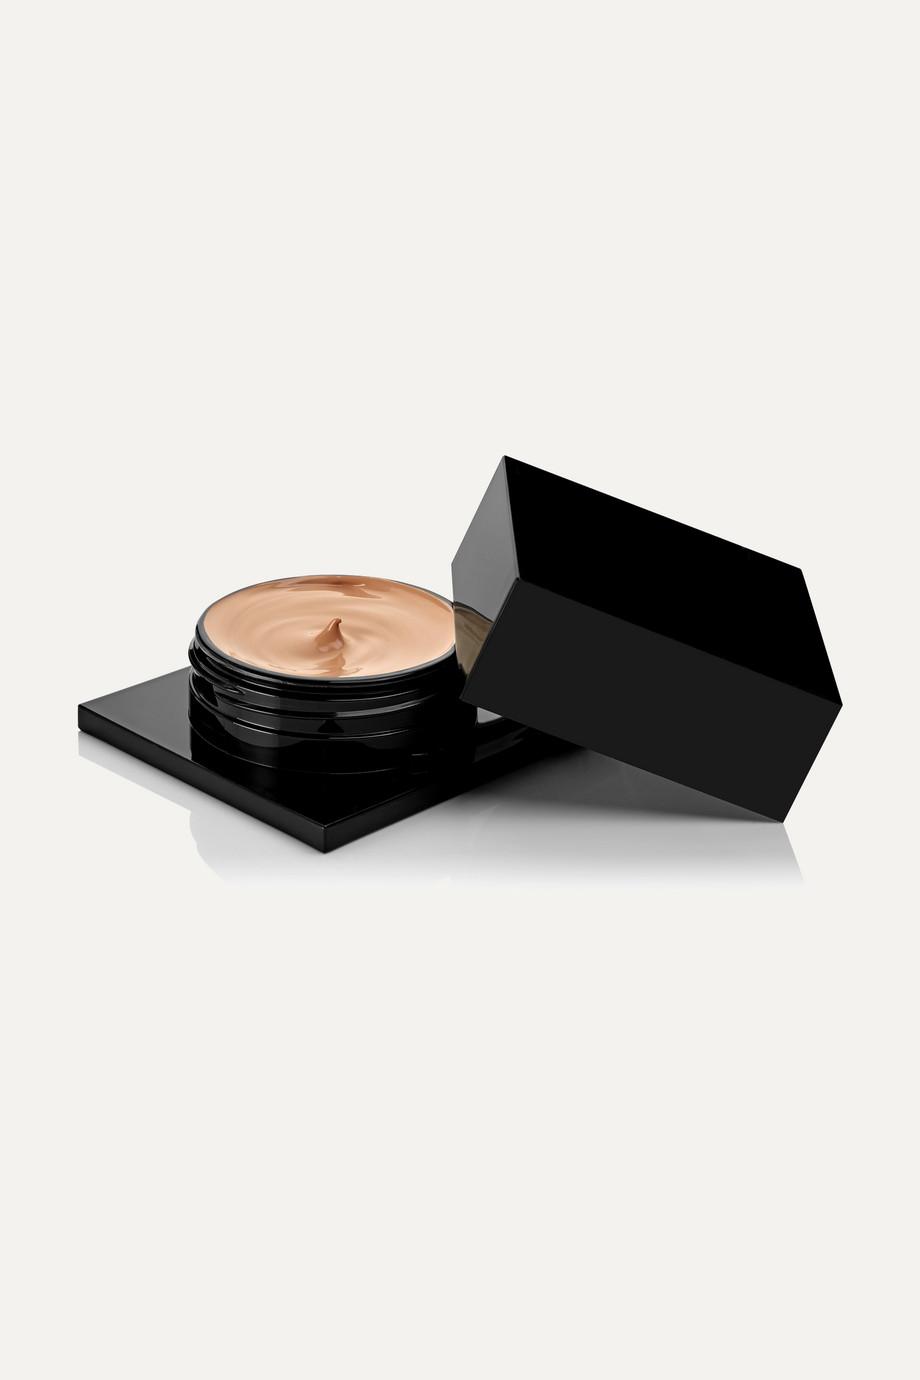 Serge Lutens Spectral Cream Foundation – 040, 30 ml – Foundation